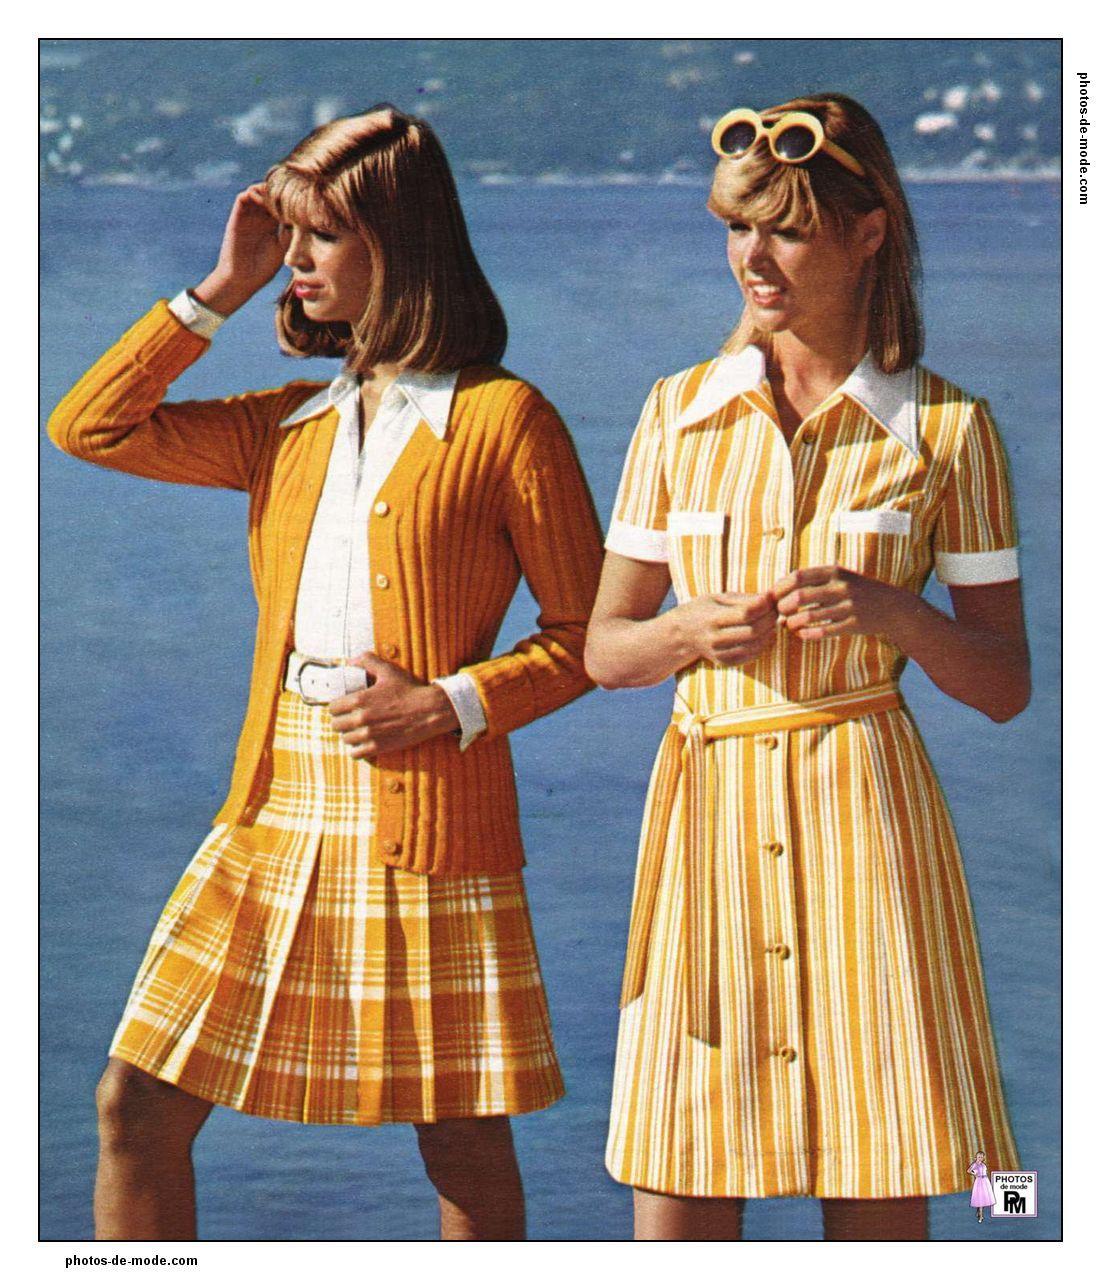 ann es 70 1973 vintage dress 70 39 s mode ann e 70. Black Bedroom Furniture Sets. Home Design Ideas